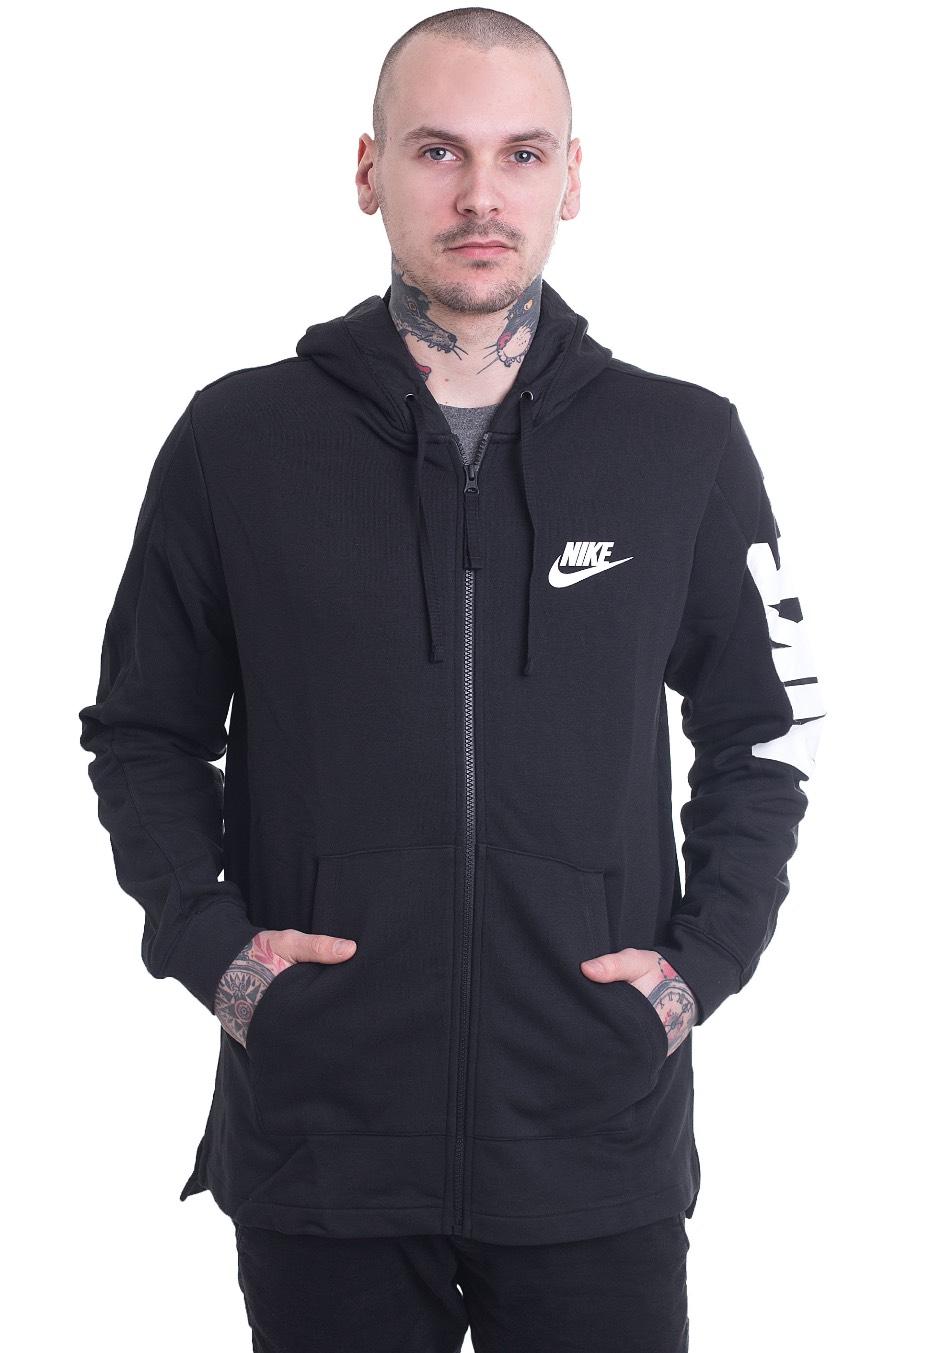 Nike Sportswear Hybrid BlackBlackWhite Zipper